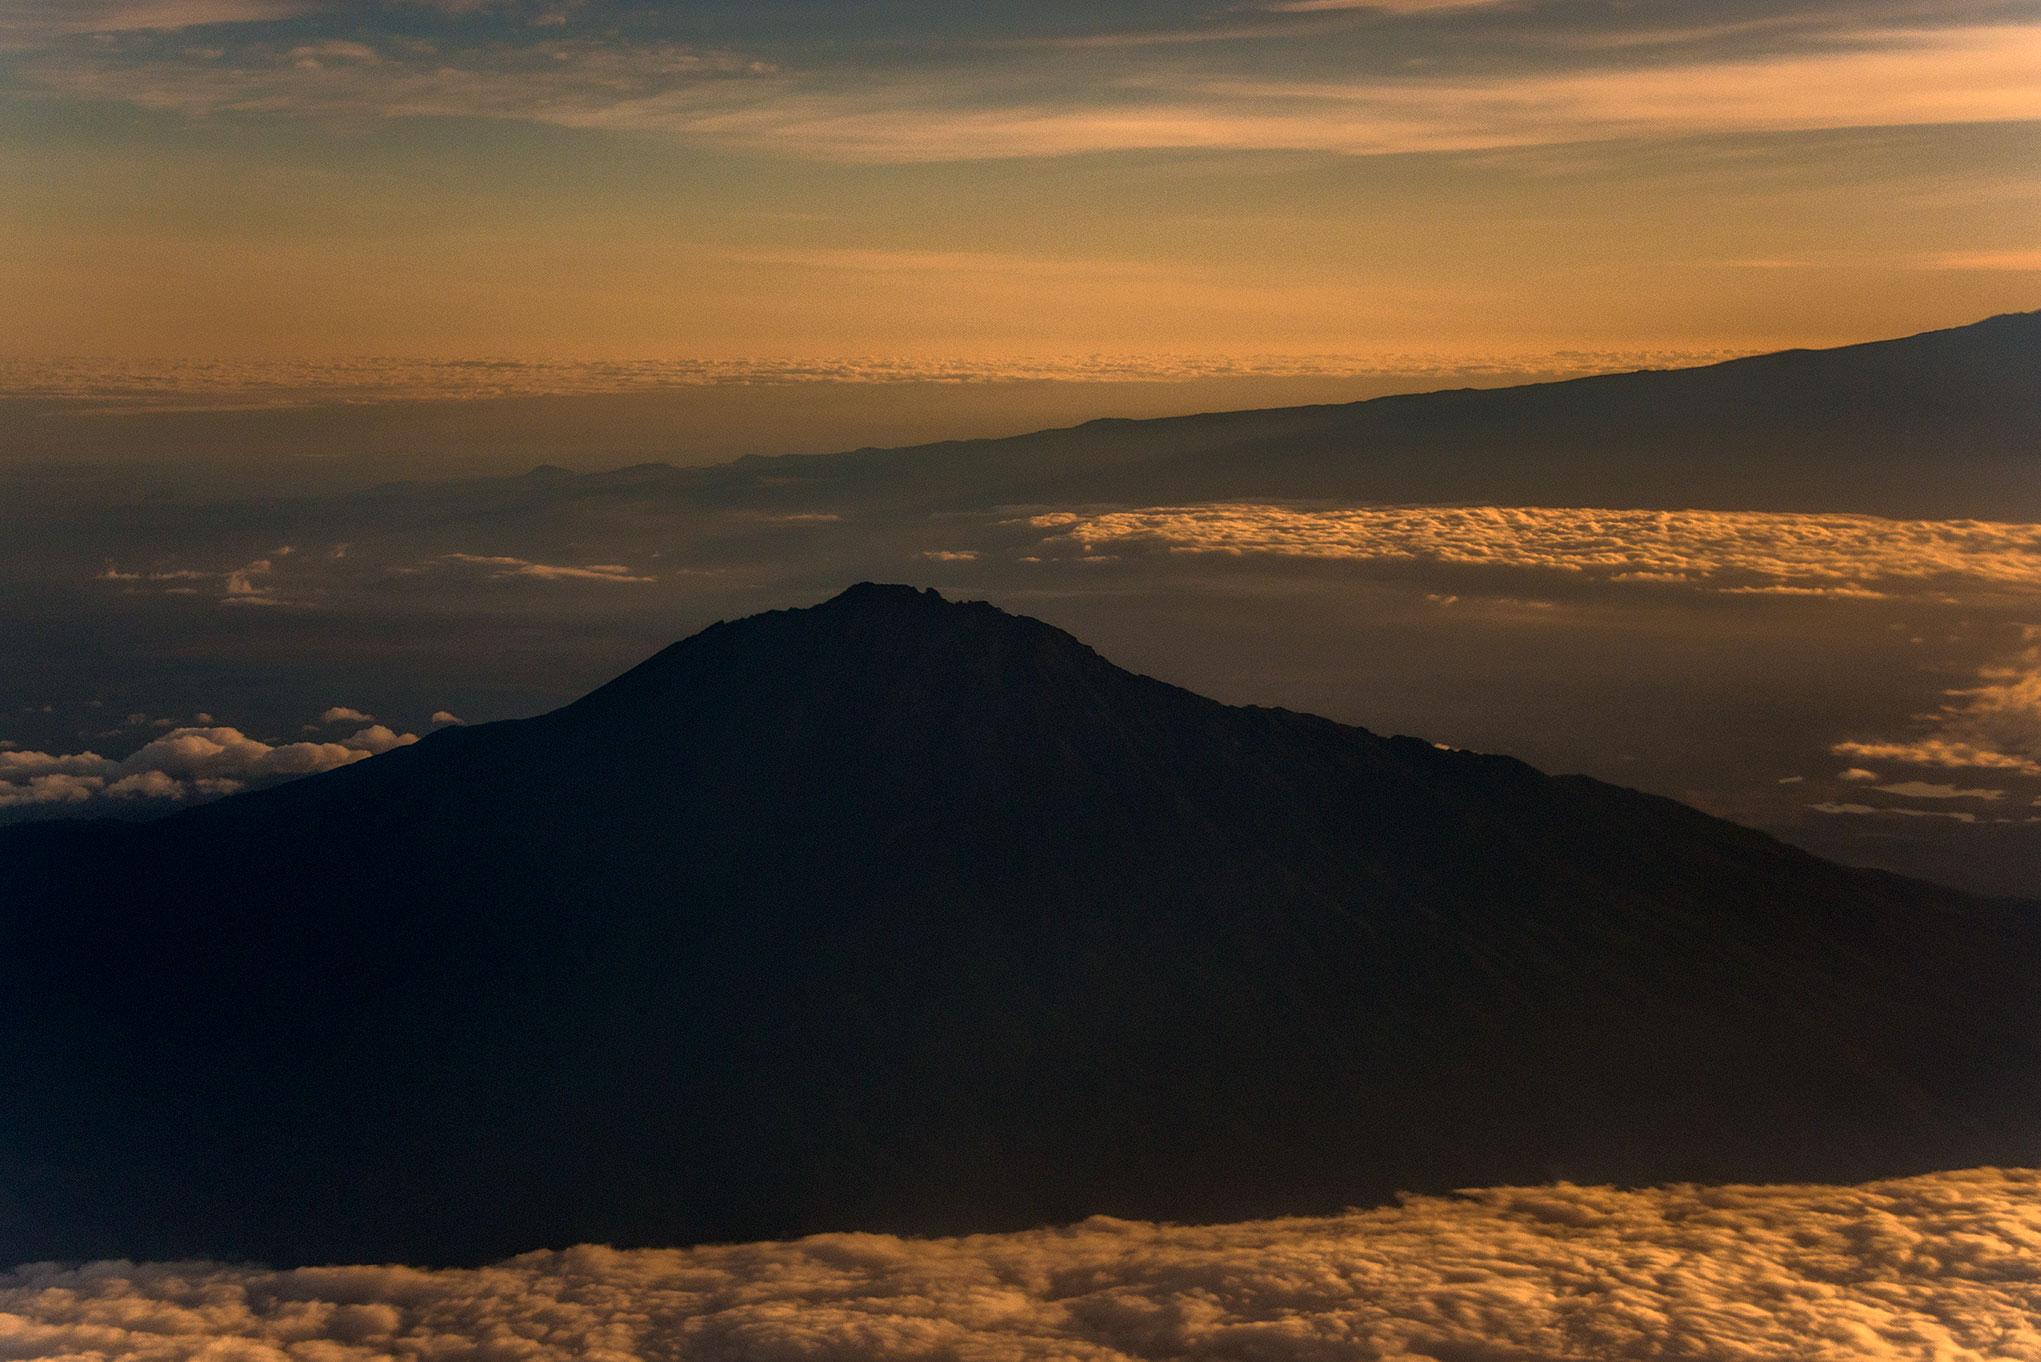 Mt Meru, Tanzania